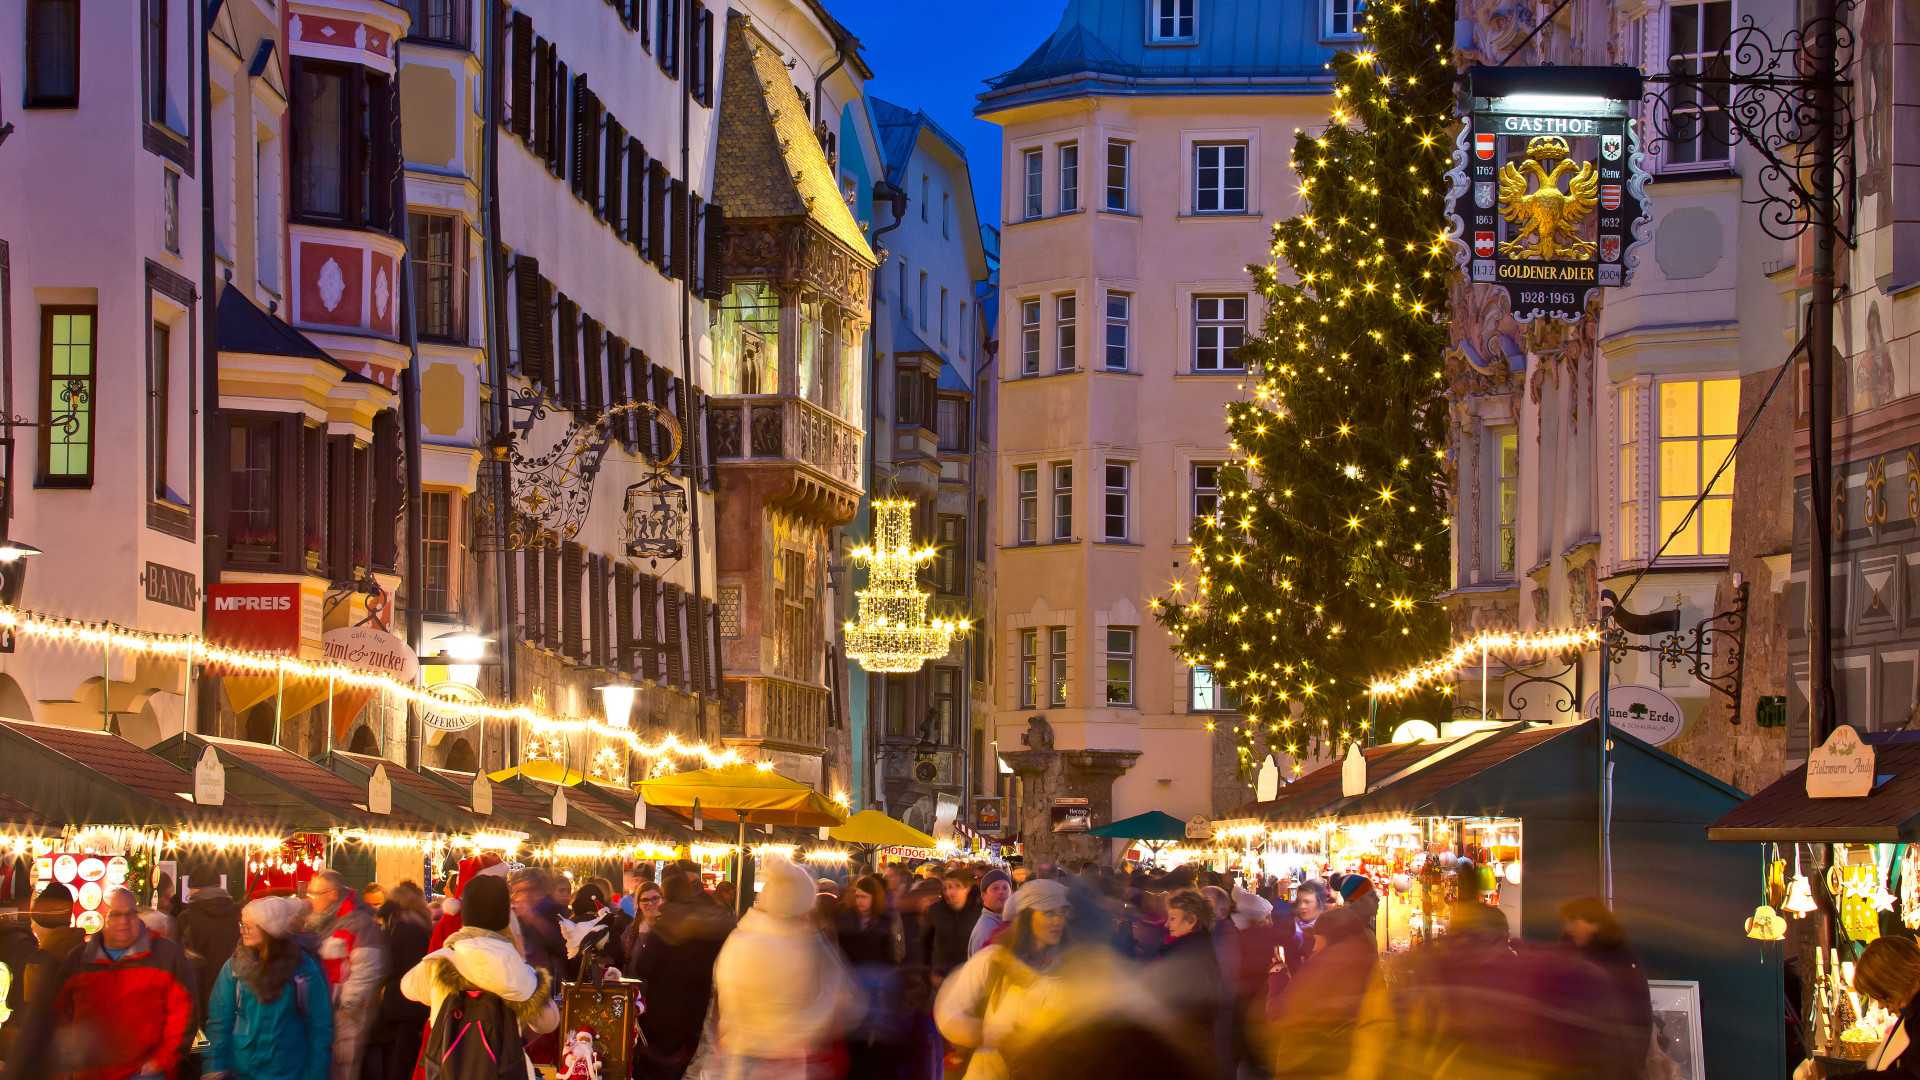 Innsbruck Christmas Market, Austria.